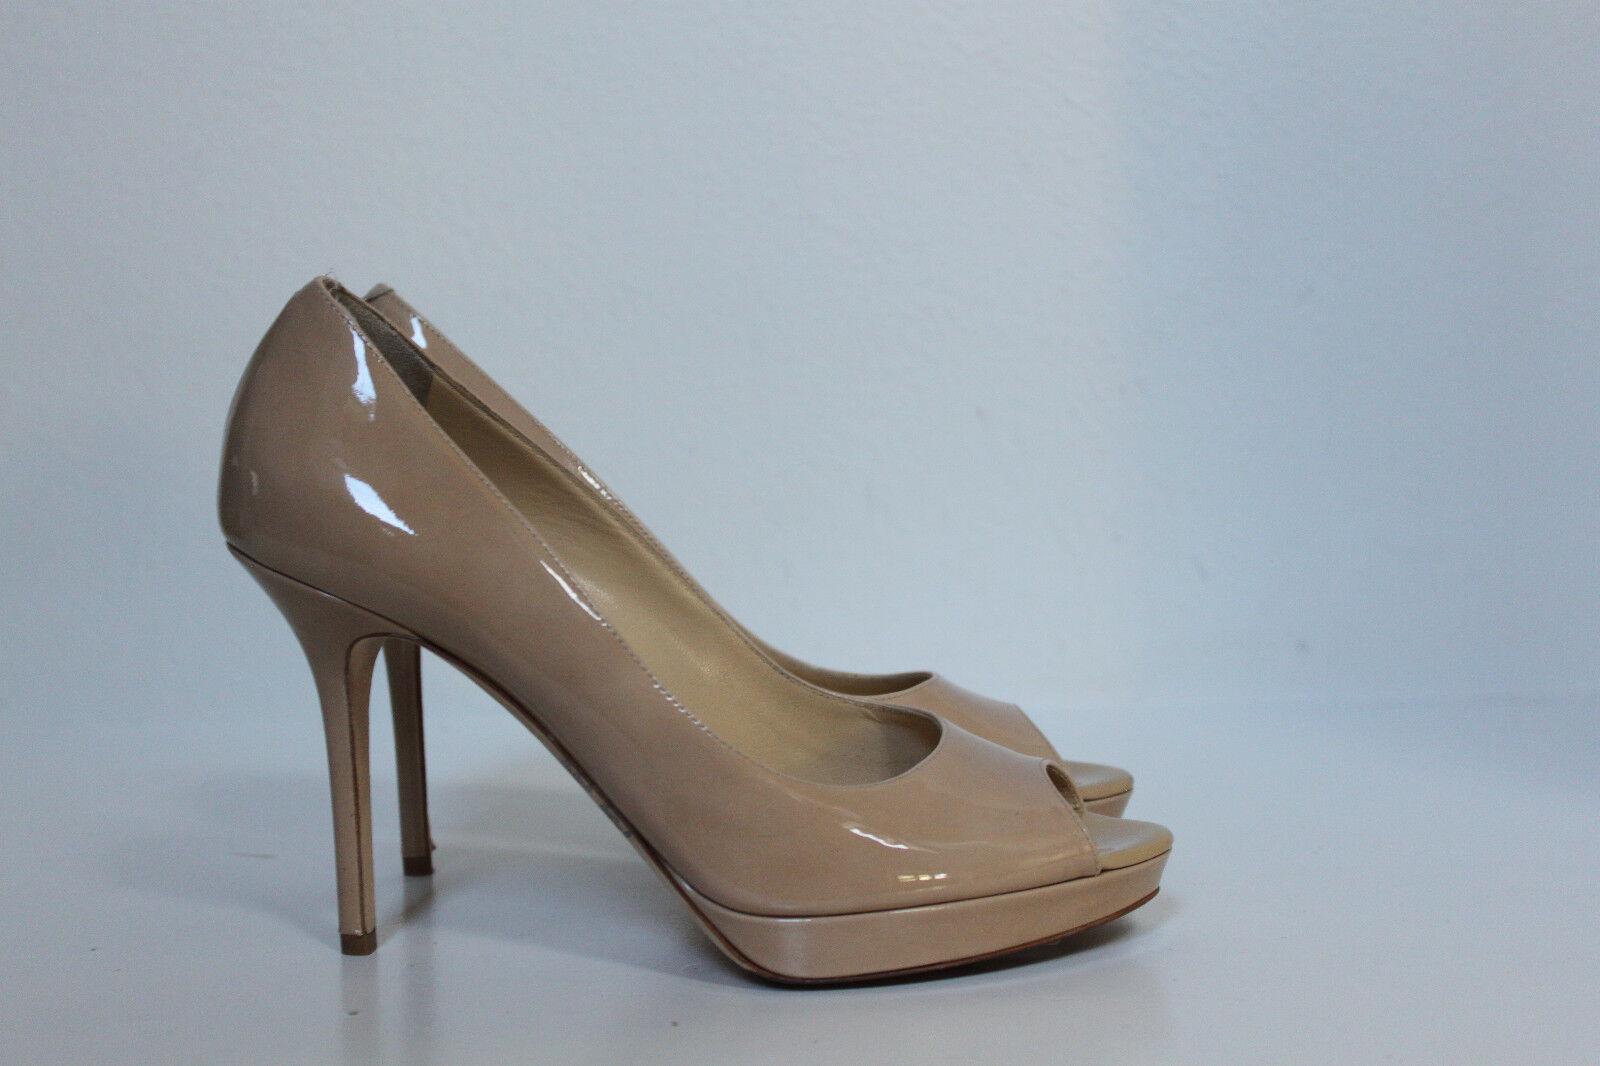 Sz 8.5 US     38.5 Jimmy Choo Nude Patent Peep Toe Platform Pump Sandals shoes bea999